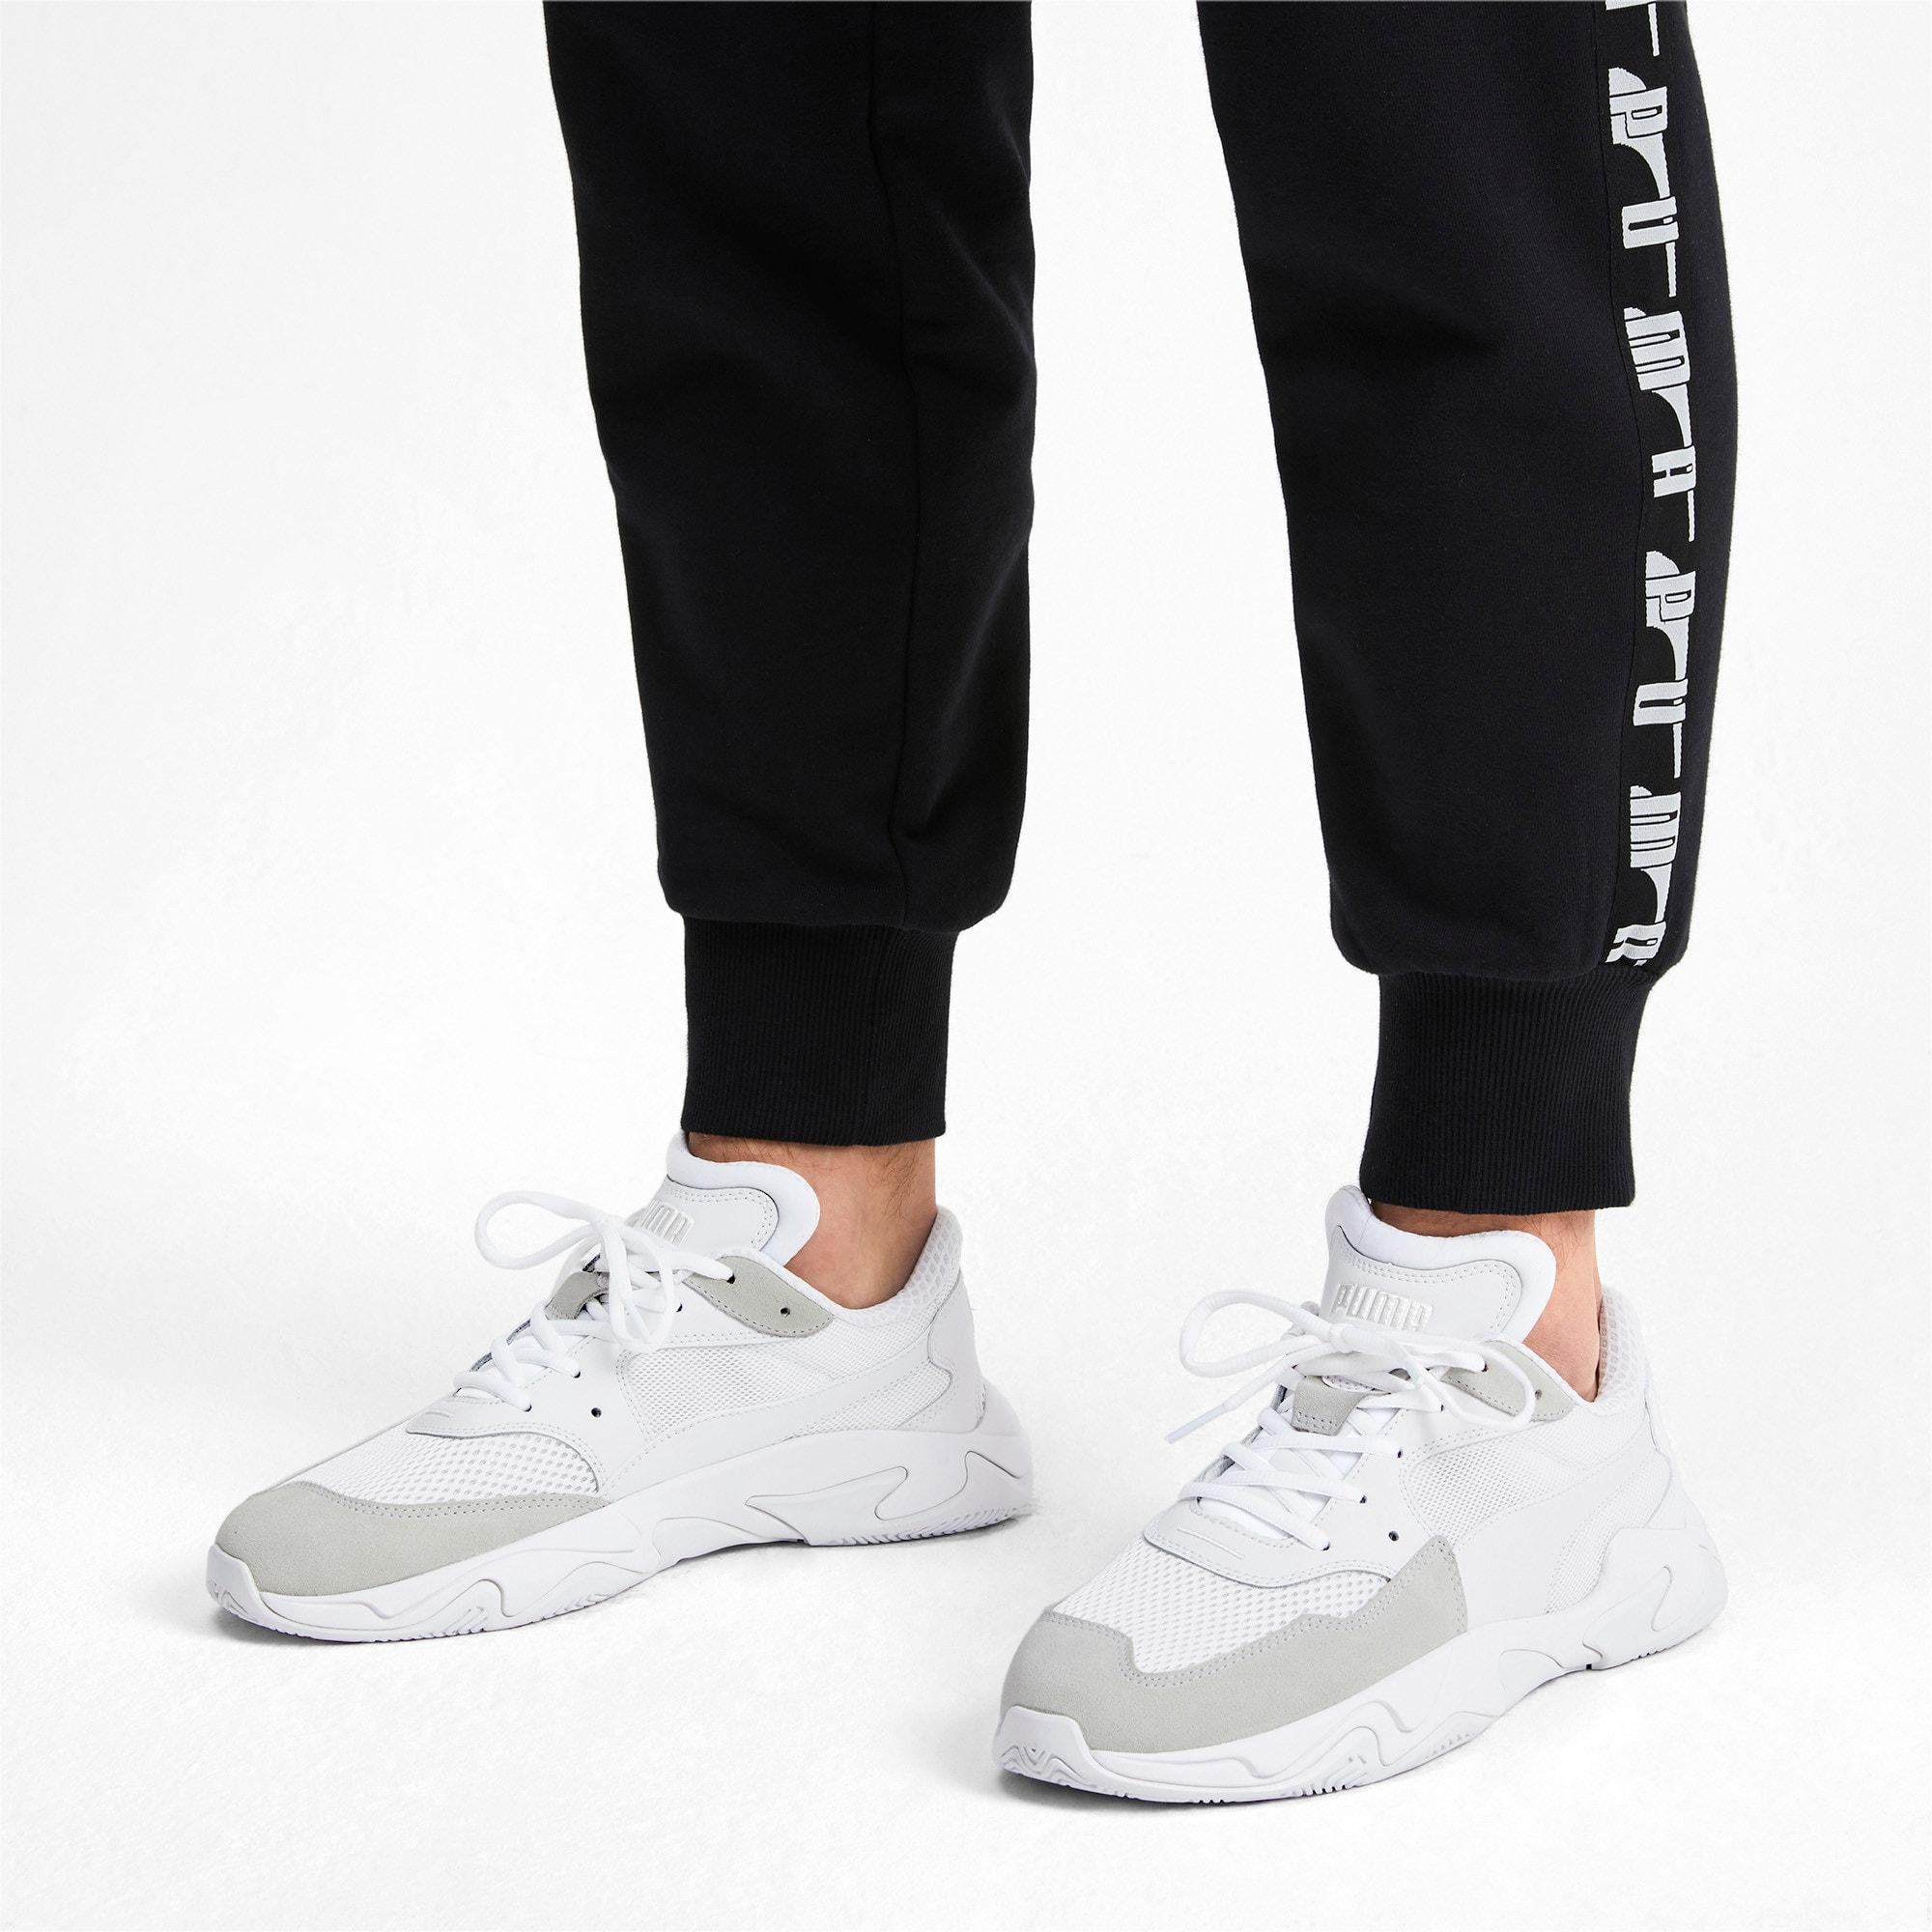 Thumbnail 2 of Storm Origin Sneaker, Puma White, medium